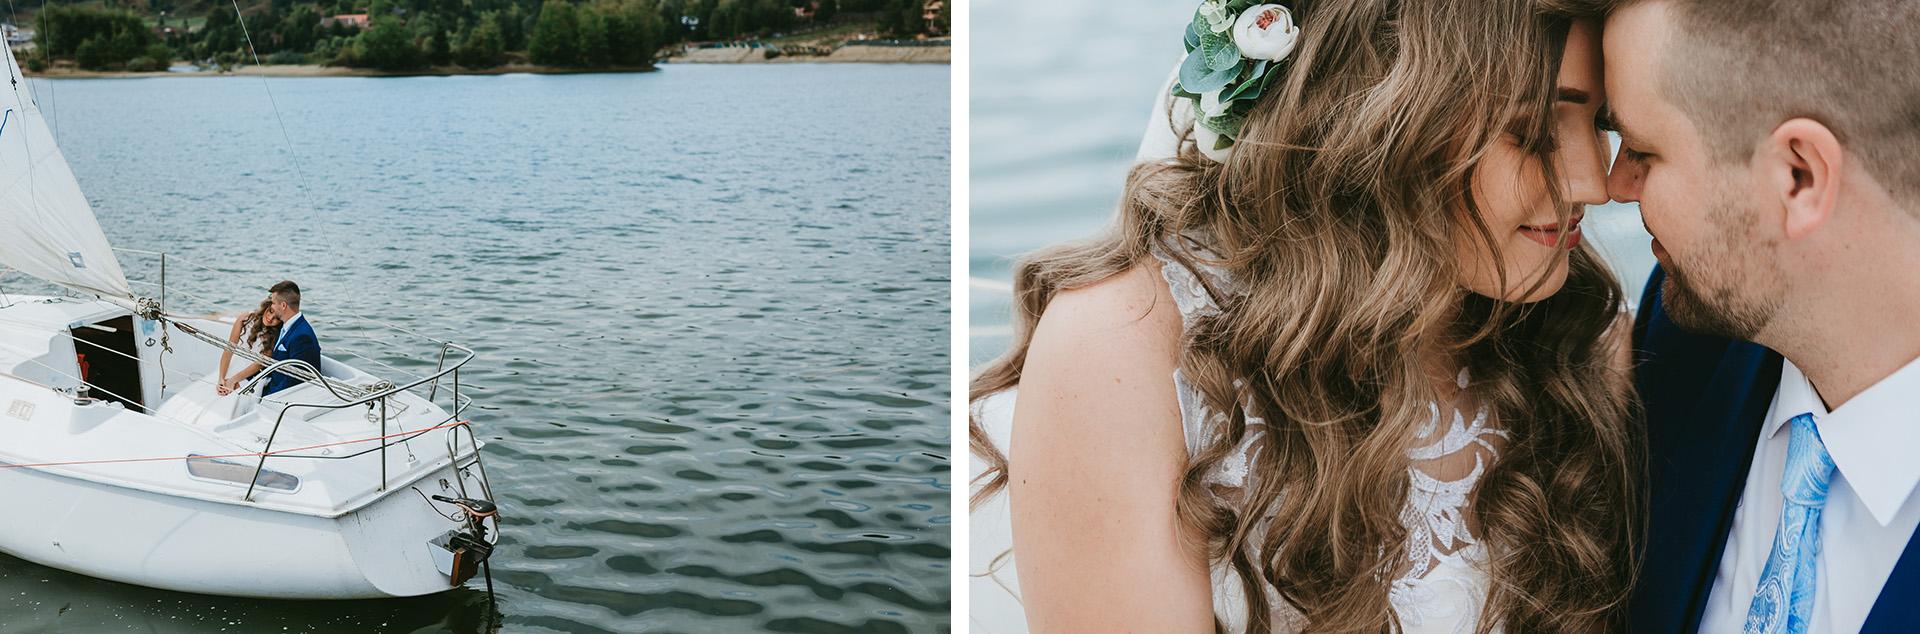 De ce sa ai 2 fotografi de nunta | youngcreative.info media © Dan Filipciuc, Cristina Bejan | fotografie de nunta in Iasi si de destinatie